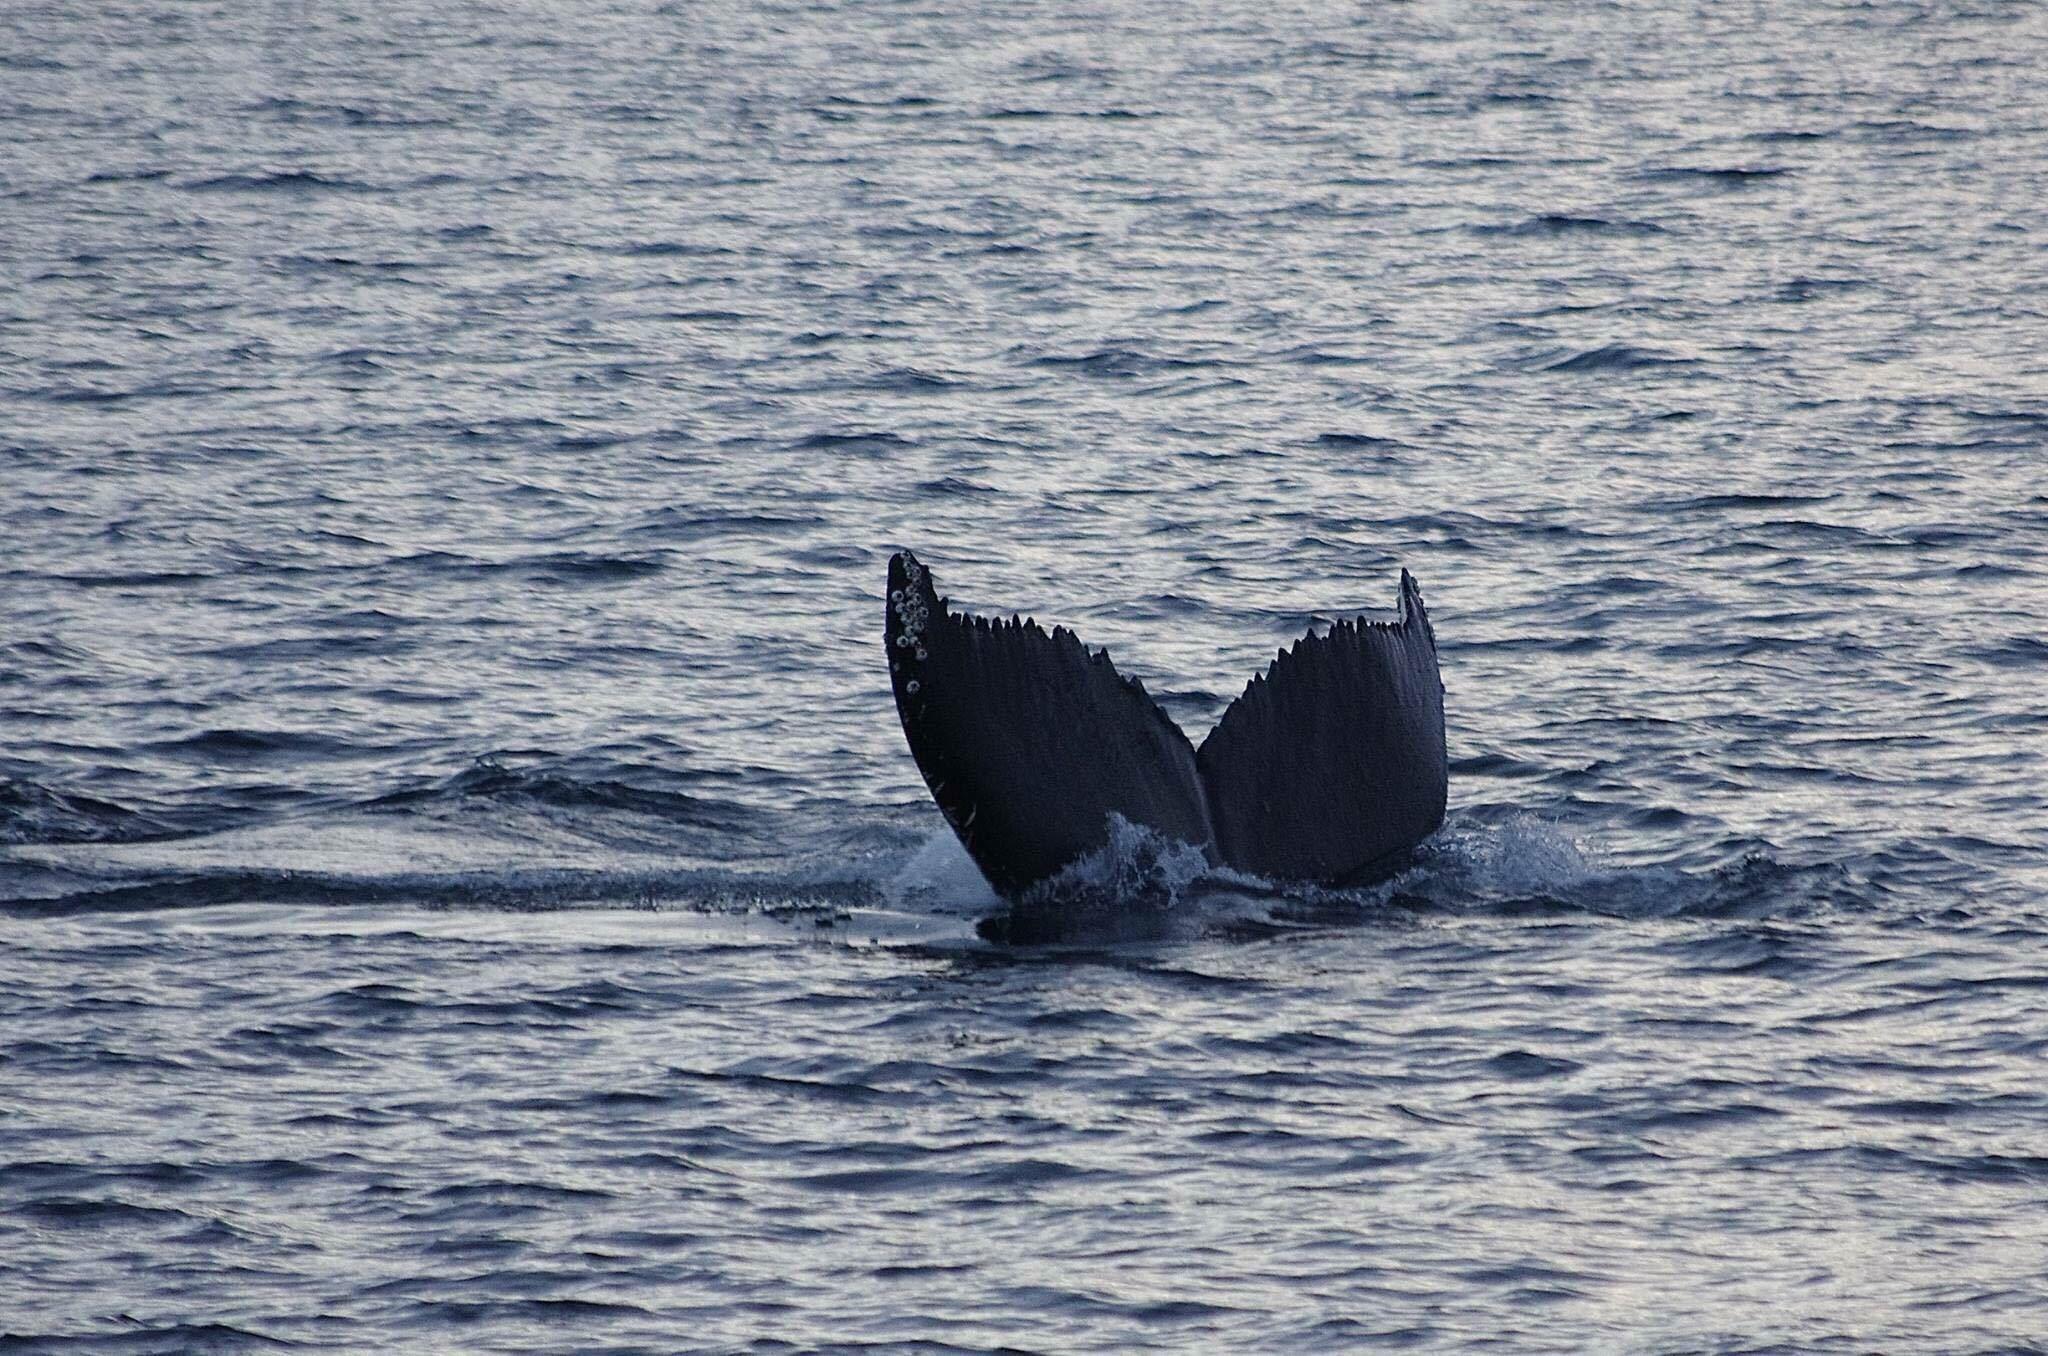 Fjord & Whale Safari 3 hours - Nord Ekspedisjon